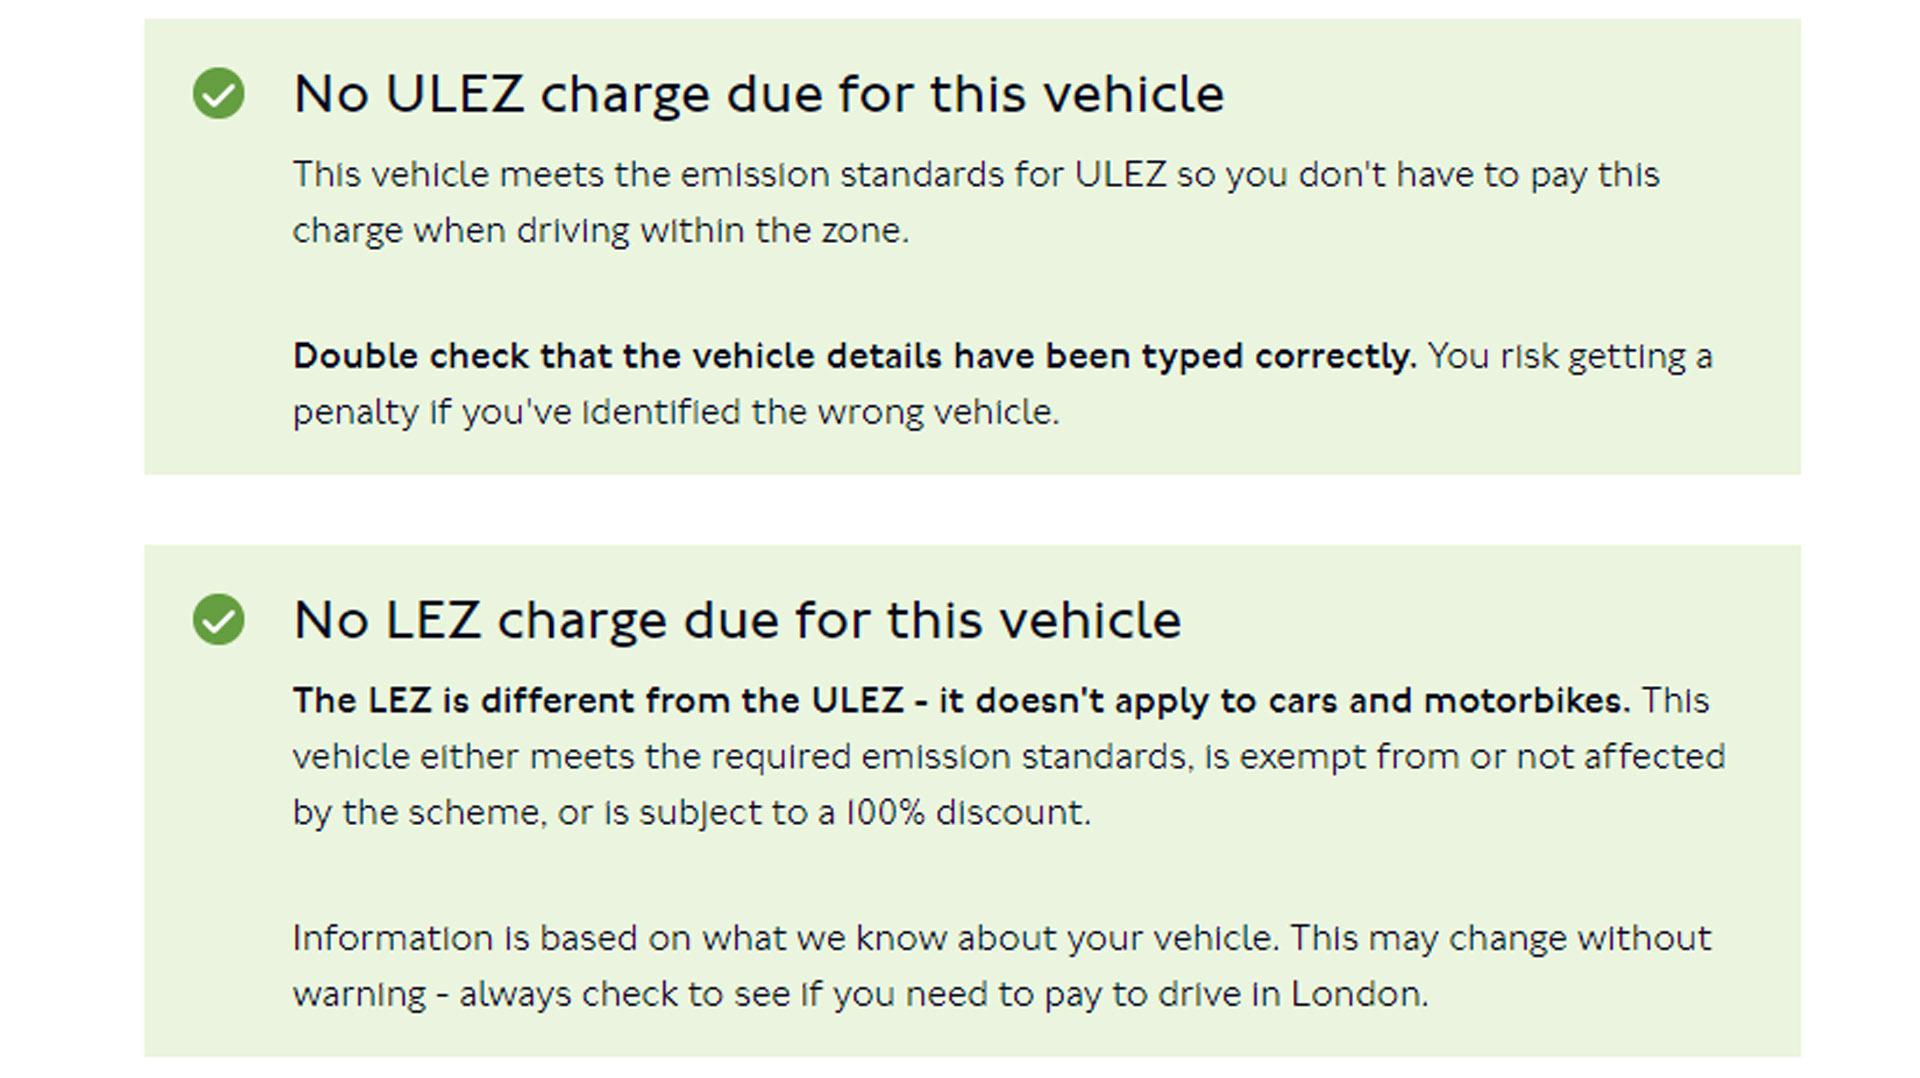 ULEZ charges